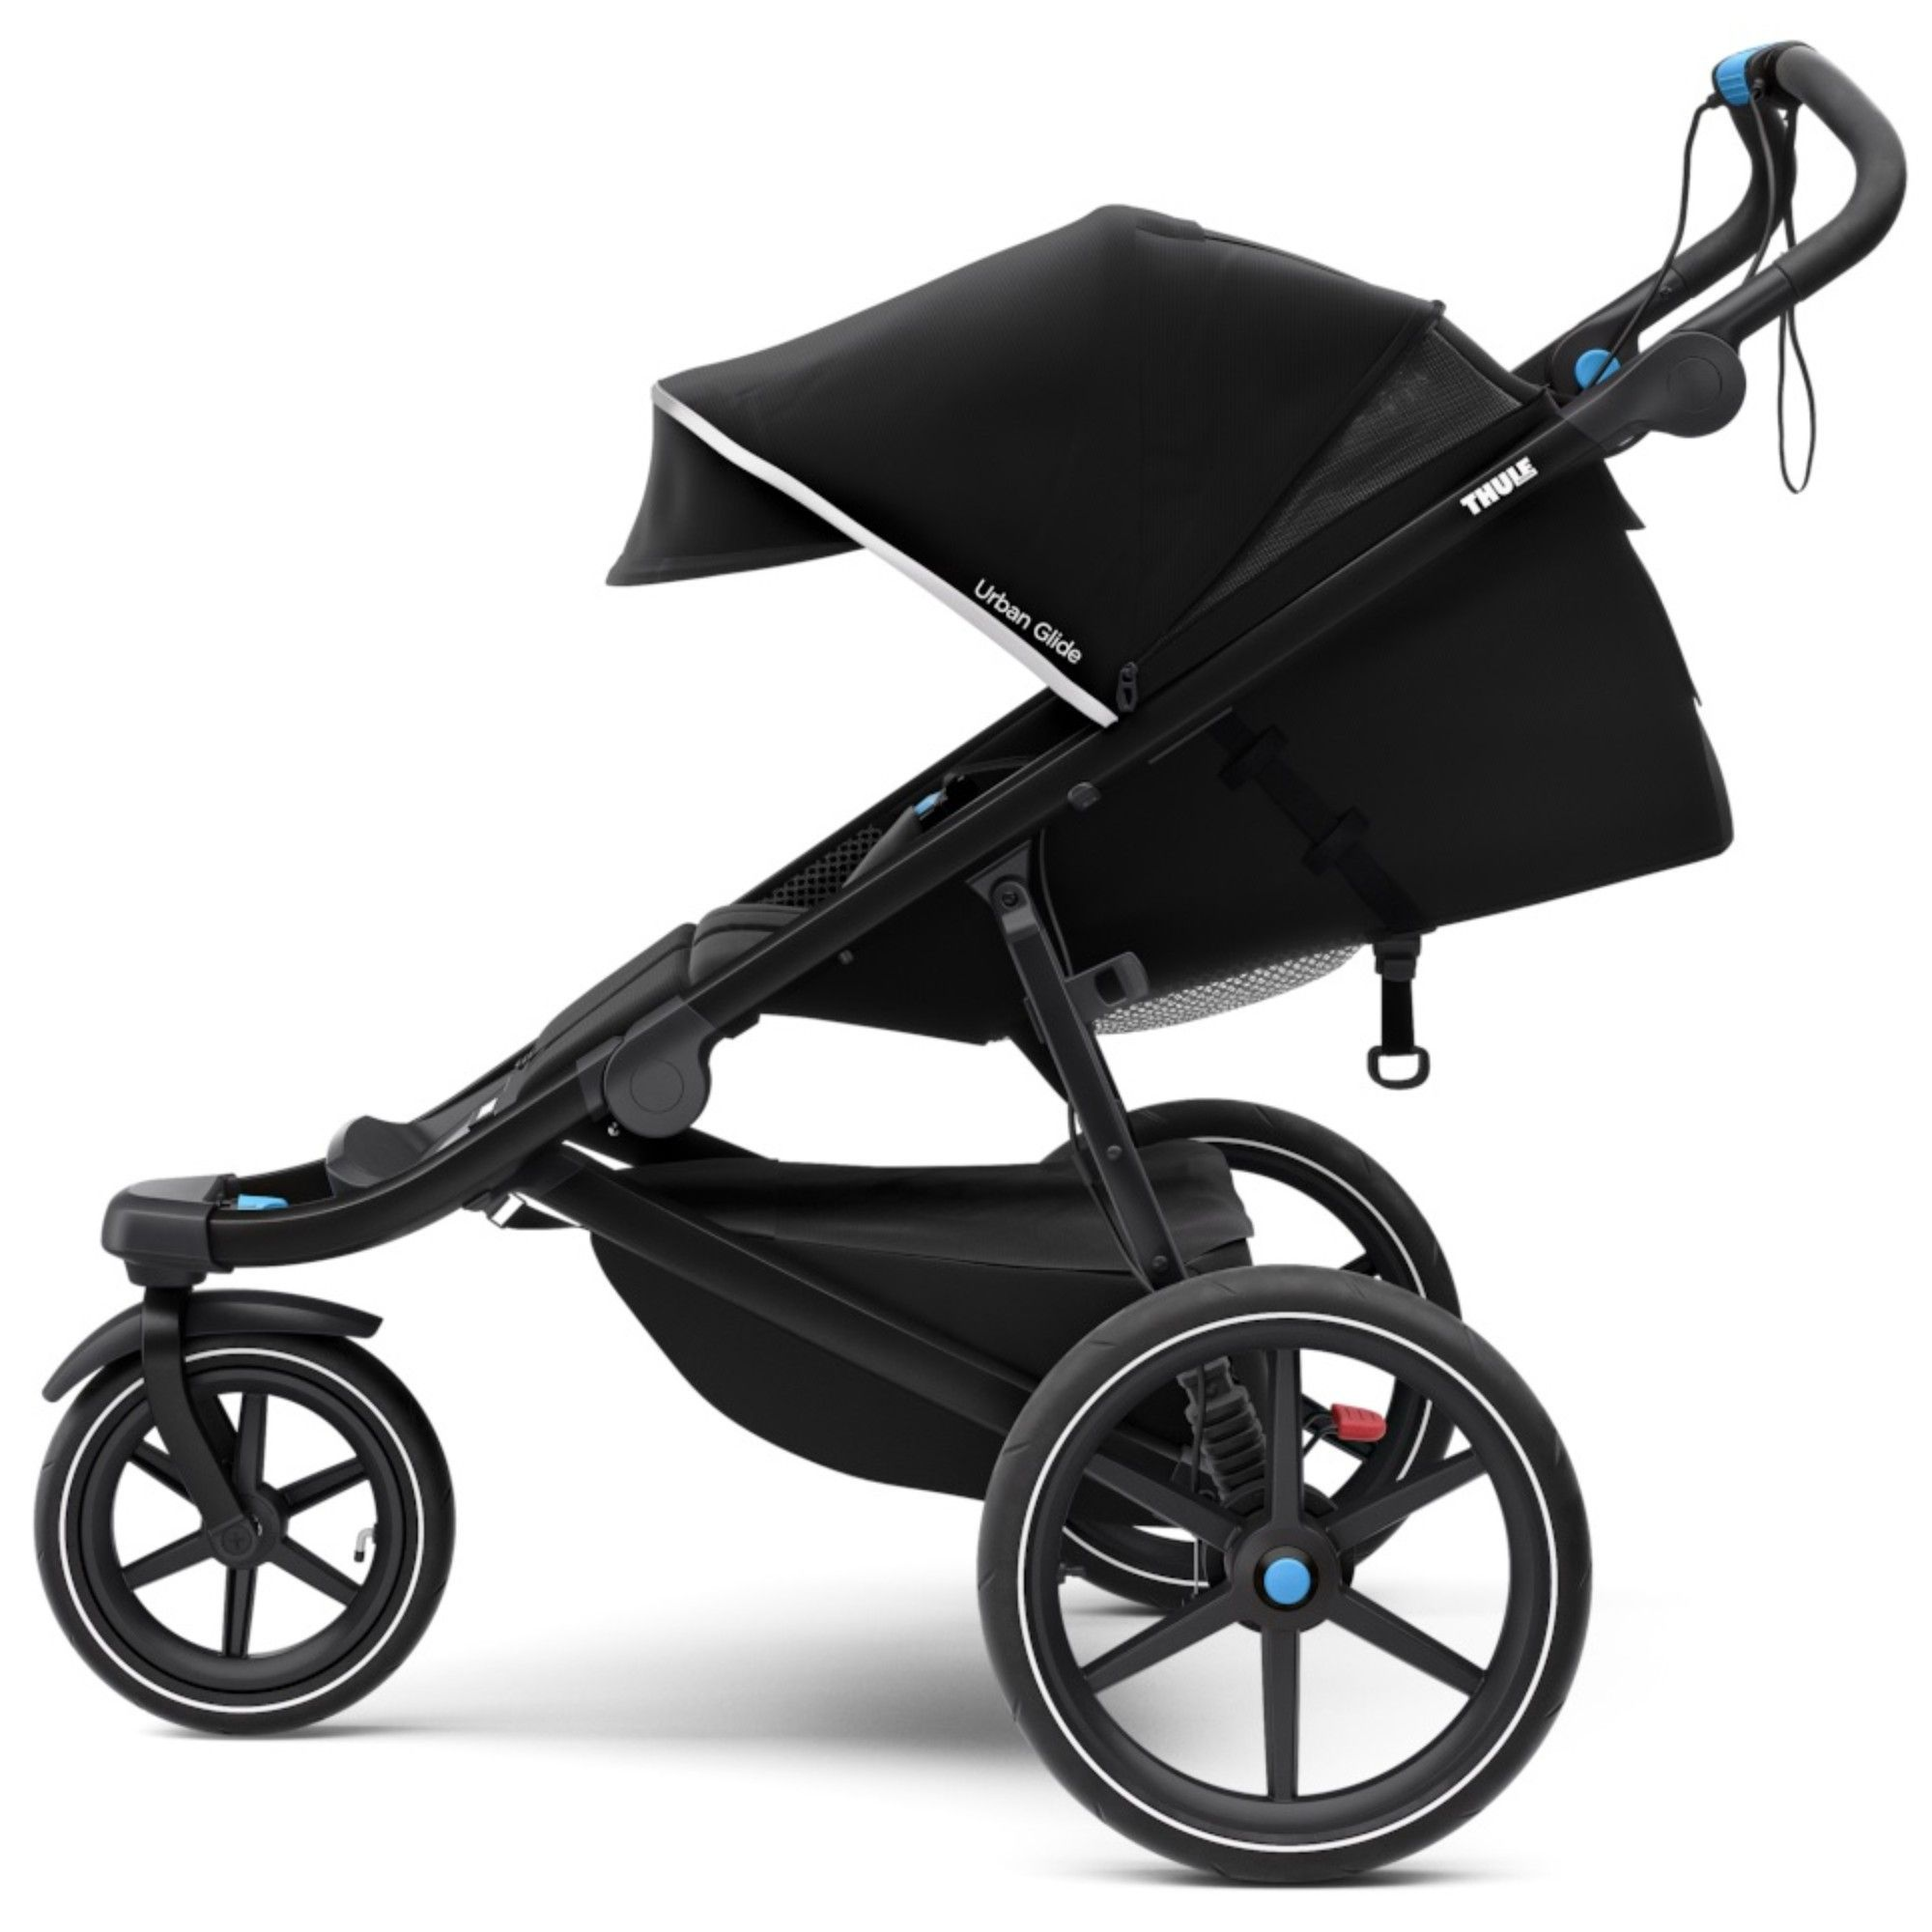 Thule Urban Glide 2 Pushchair/Stroller/Buggy – 6M-34kg